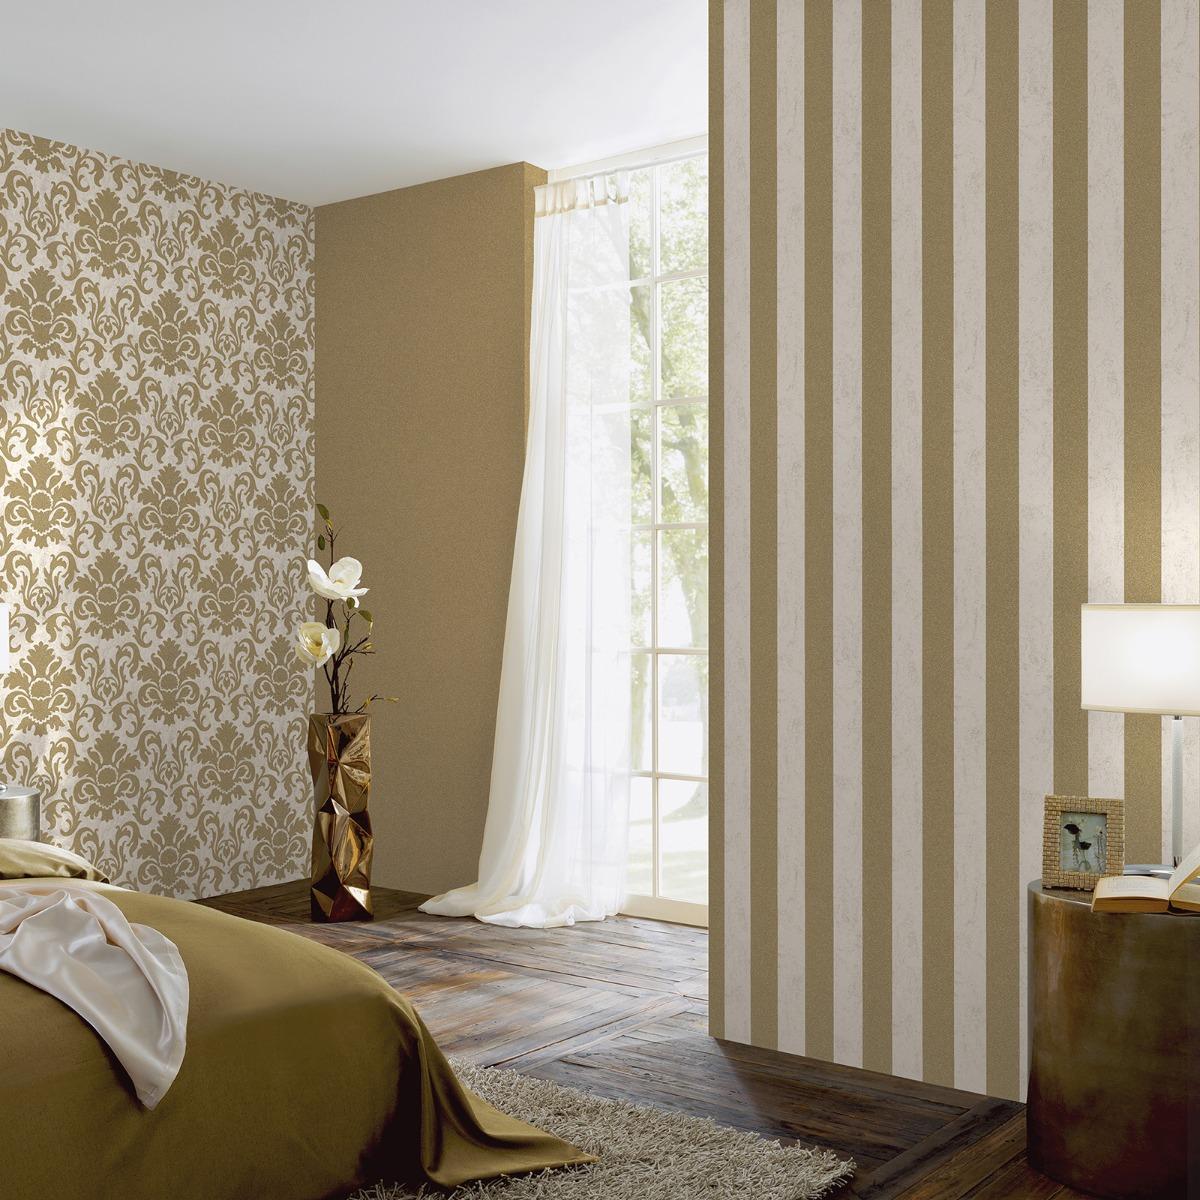 Carat Glitter Stripe Wallpaper Cream and Gold